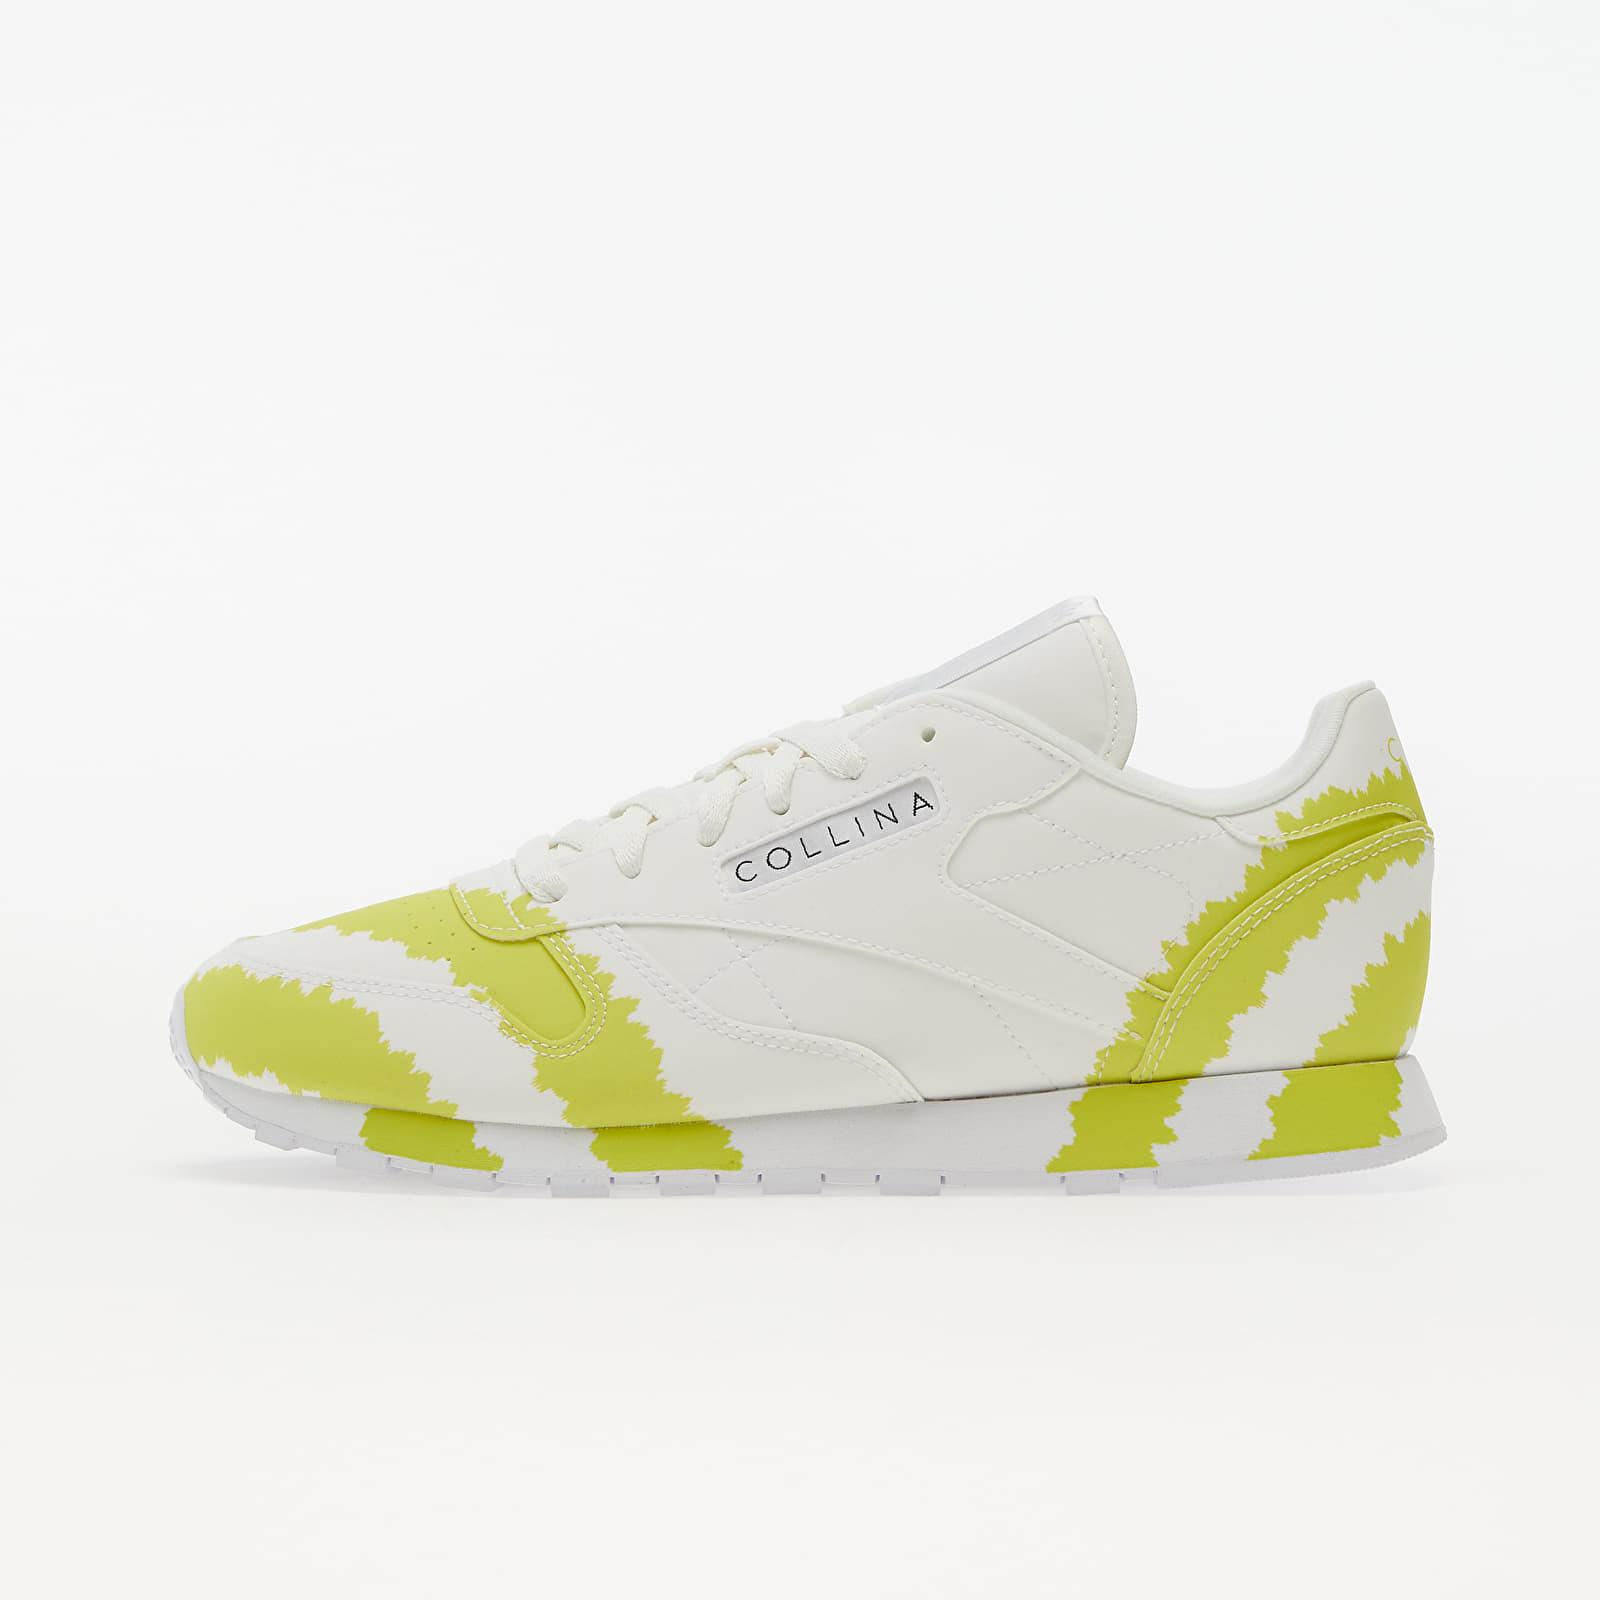 Reebok x Collina Strada Classic Leather Ftw White/ Digital Blue/ Active Yellow EUR 40.5